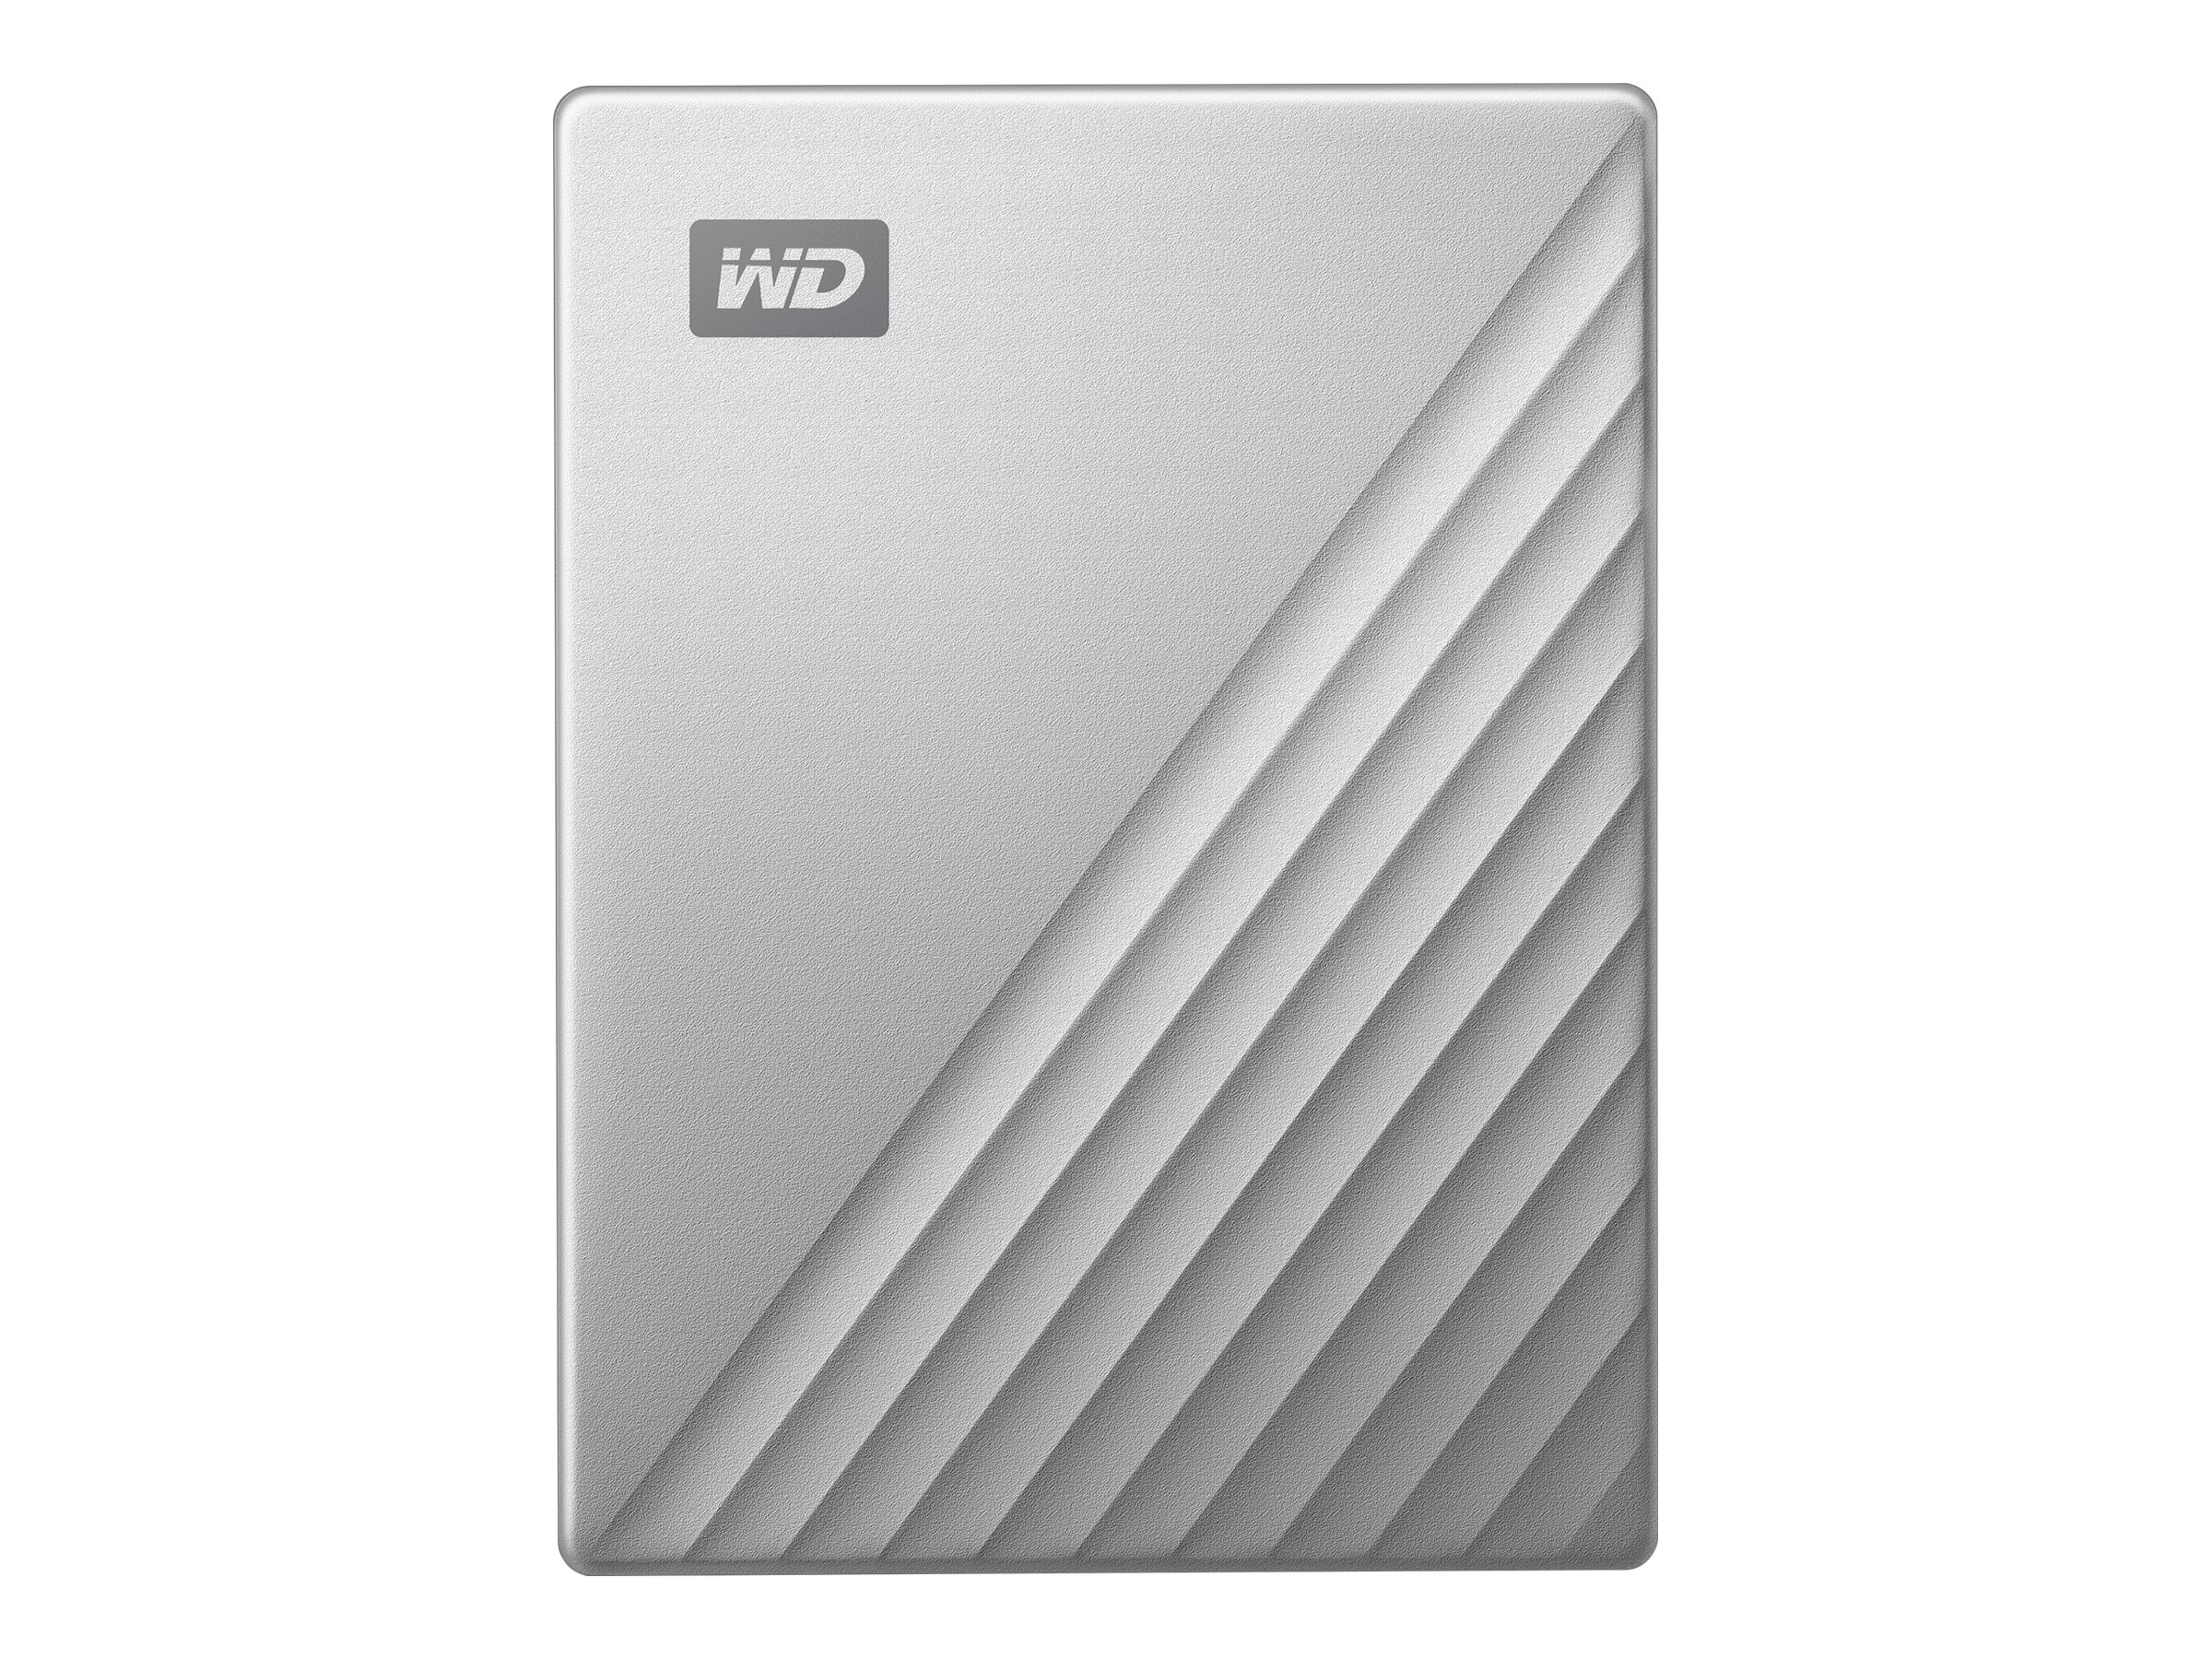 WD My Passport Ultra WDBC3C0020BSL - Festplatte - verschlüsselt - 2 TB - extern (tragbar) - USB 3.0 (USB-C Steckverbinder)